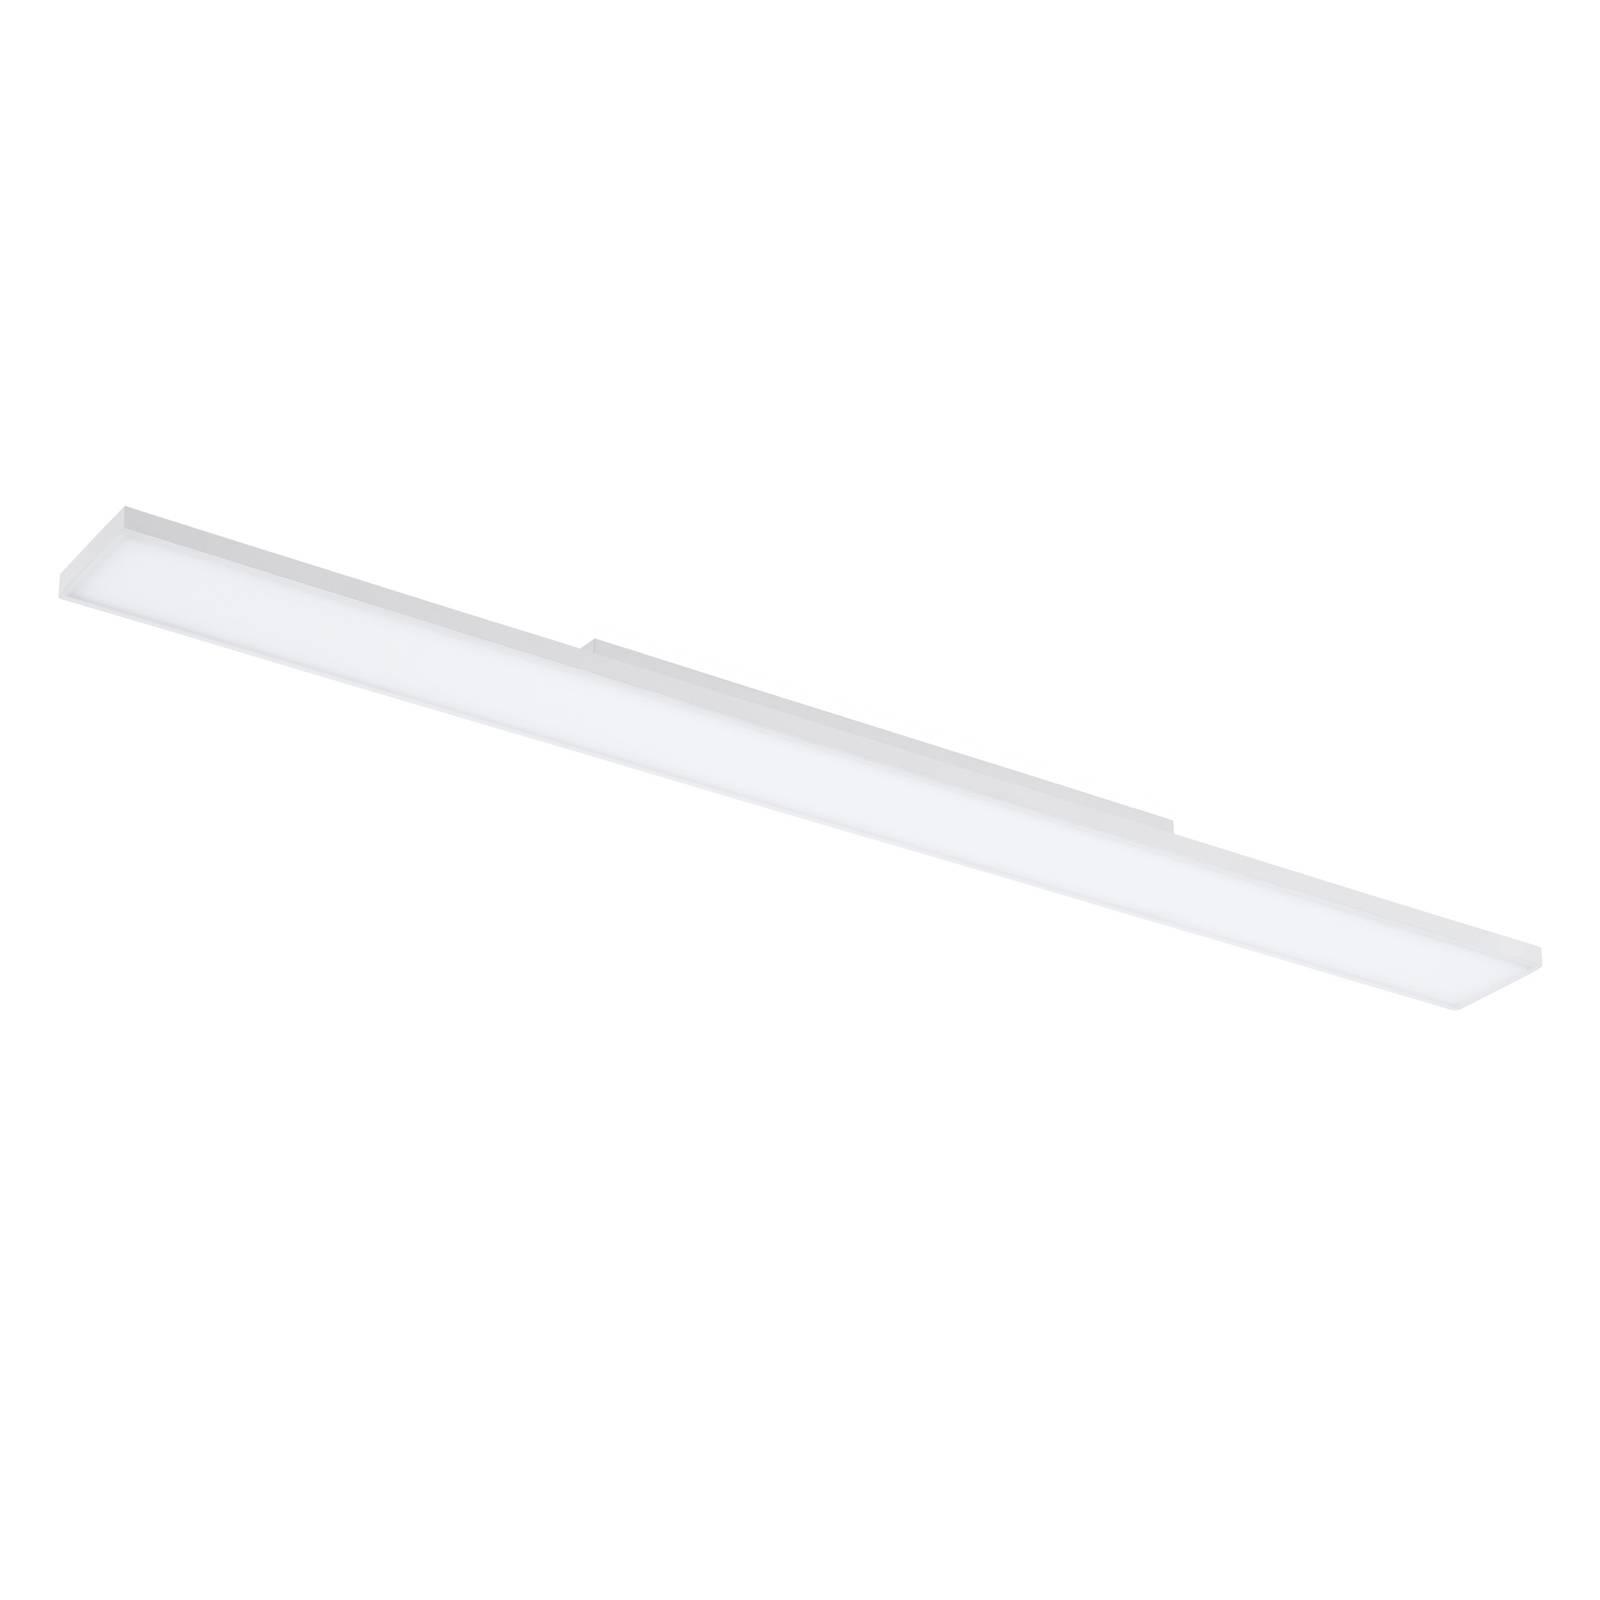 LED-Deckenleuchte Turcona, 120 x 10 cm